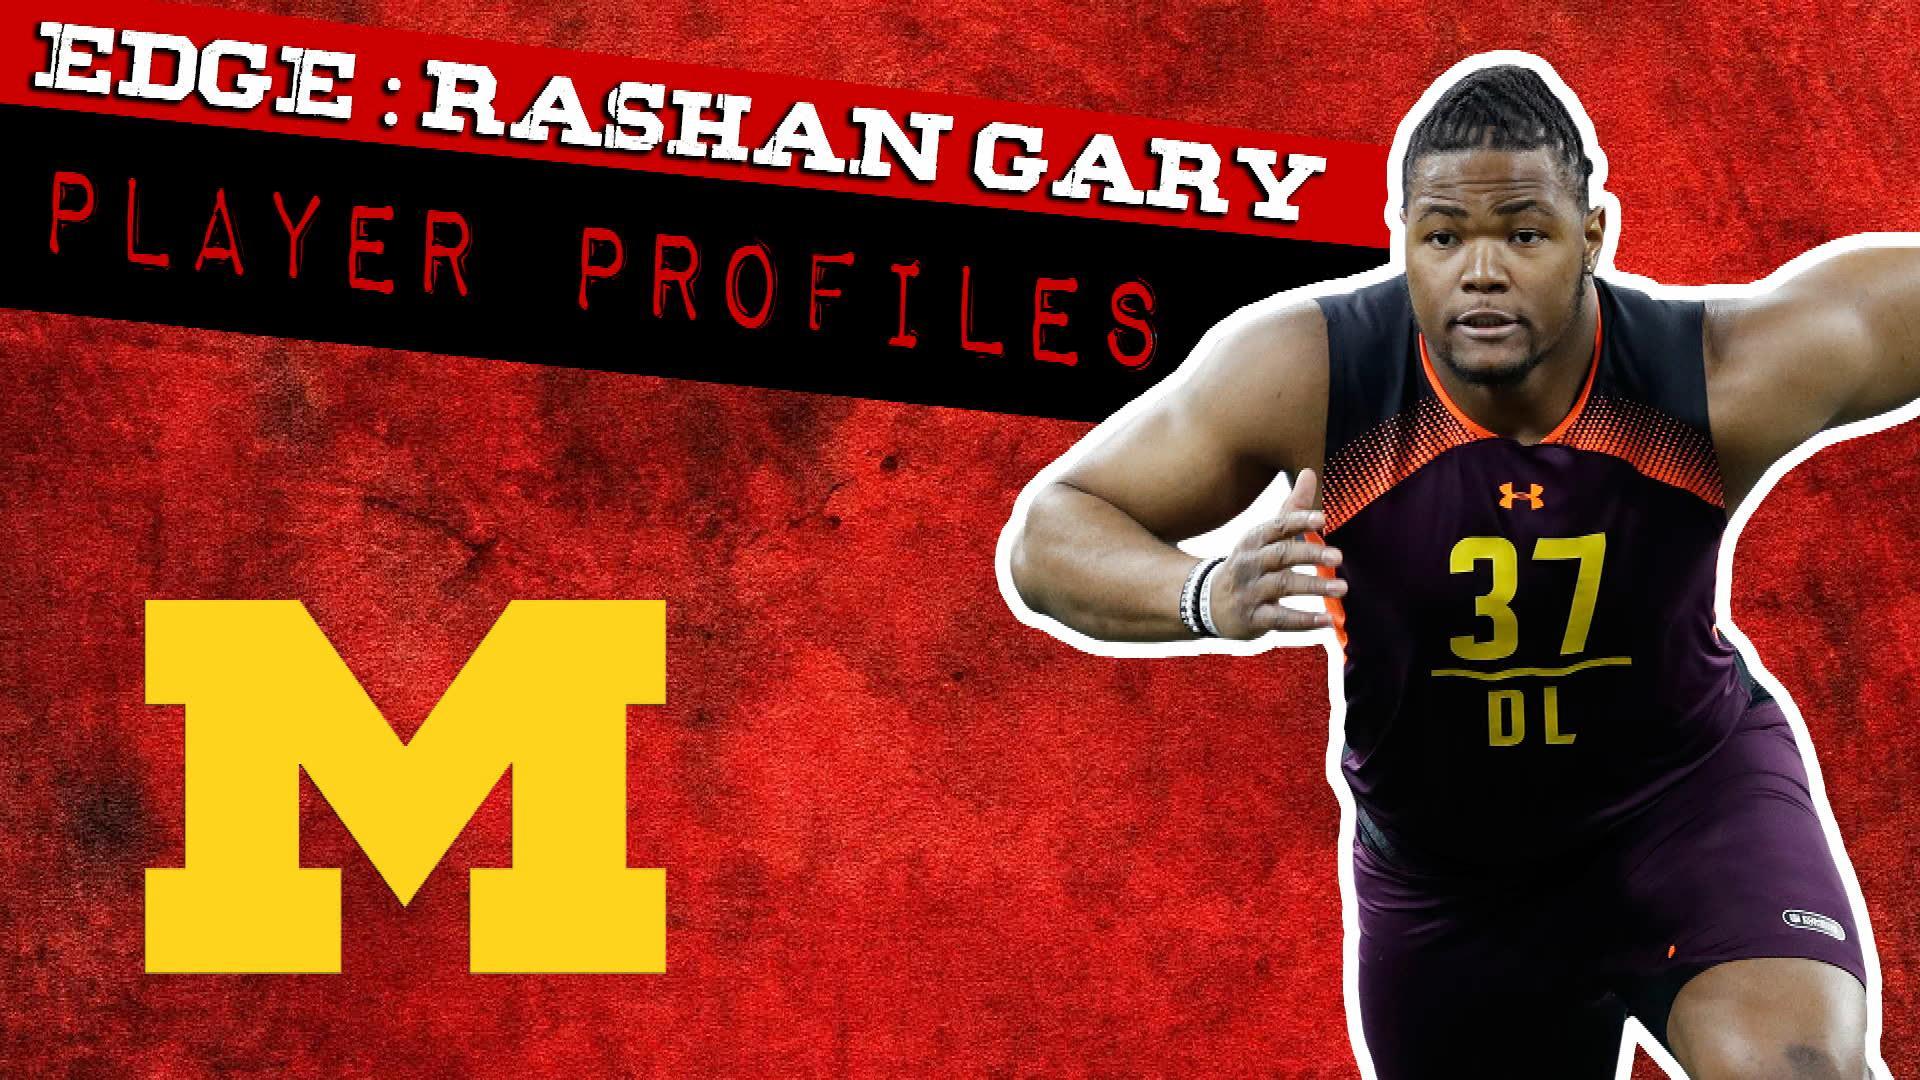 2019 NFL Draft profile: Rashan Gary, Michigan